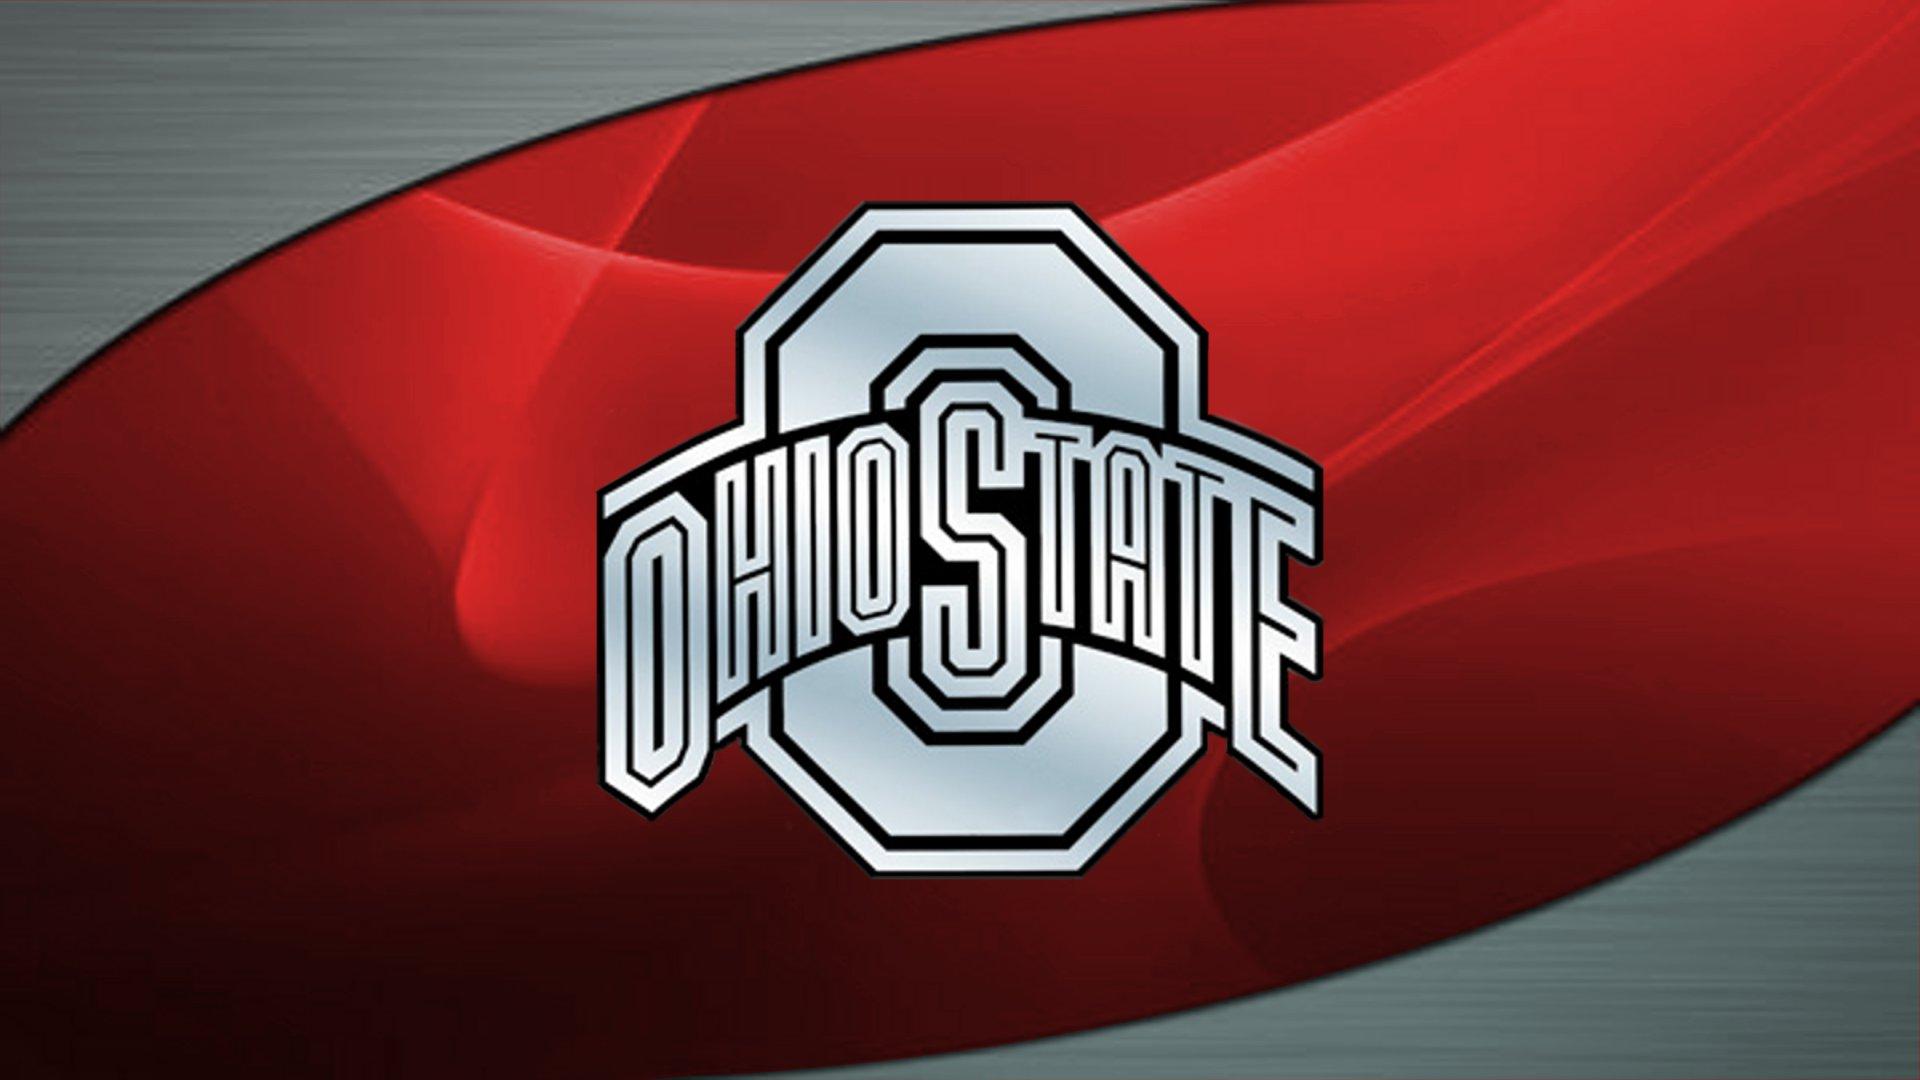 Ohio State National Champions Wallpaper